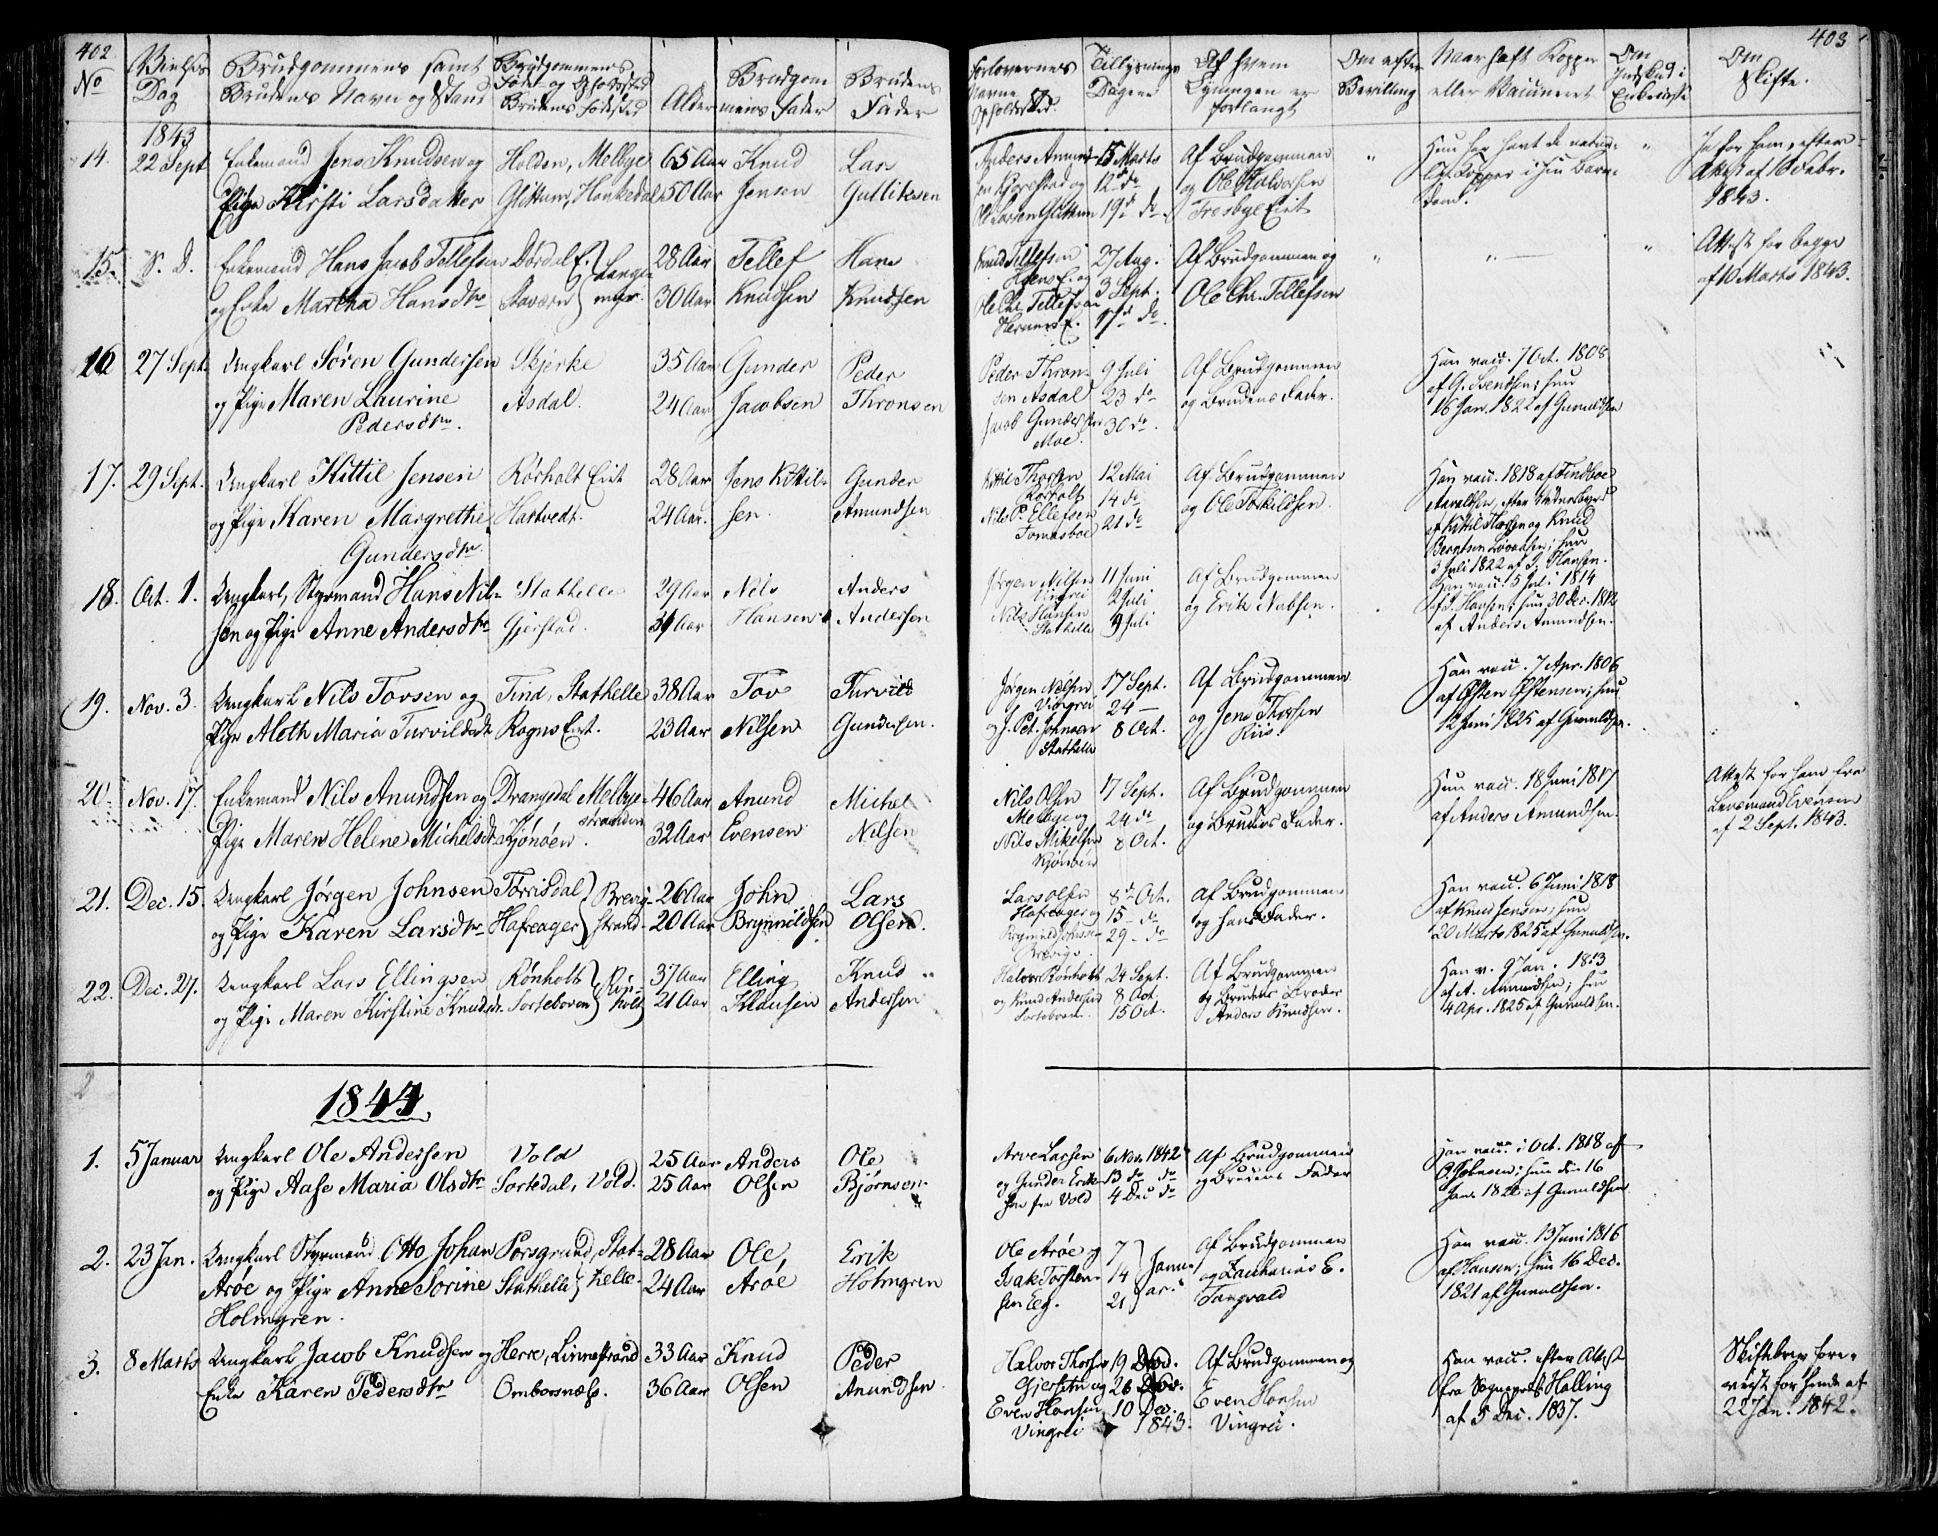 SAKO, Bamble kirkebøker, F/Fa/L0004: Ministerialbok nr. I 4, 1834-1853, s. 402-403